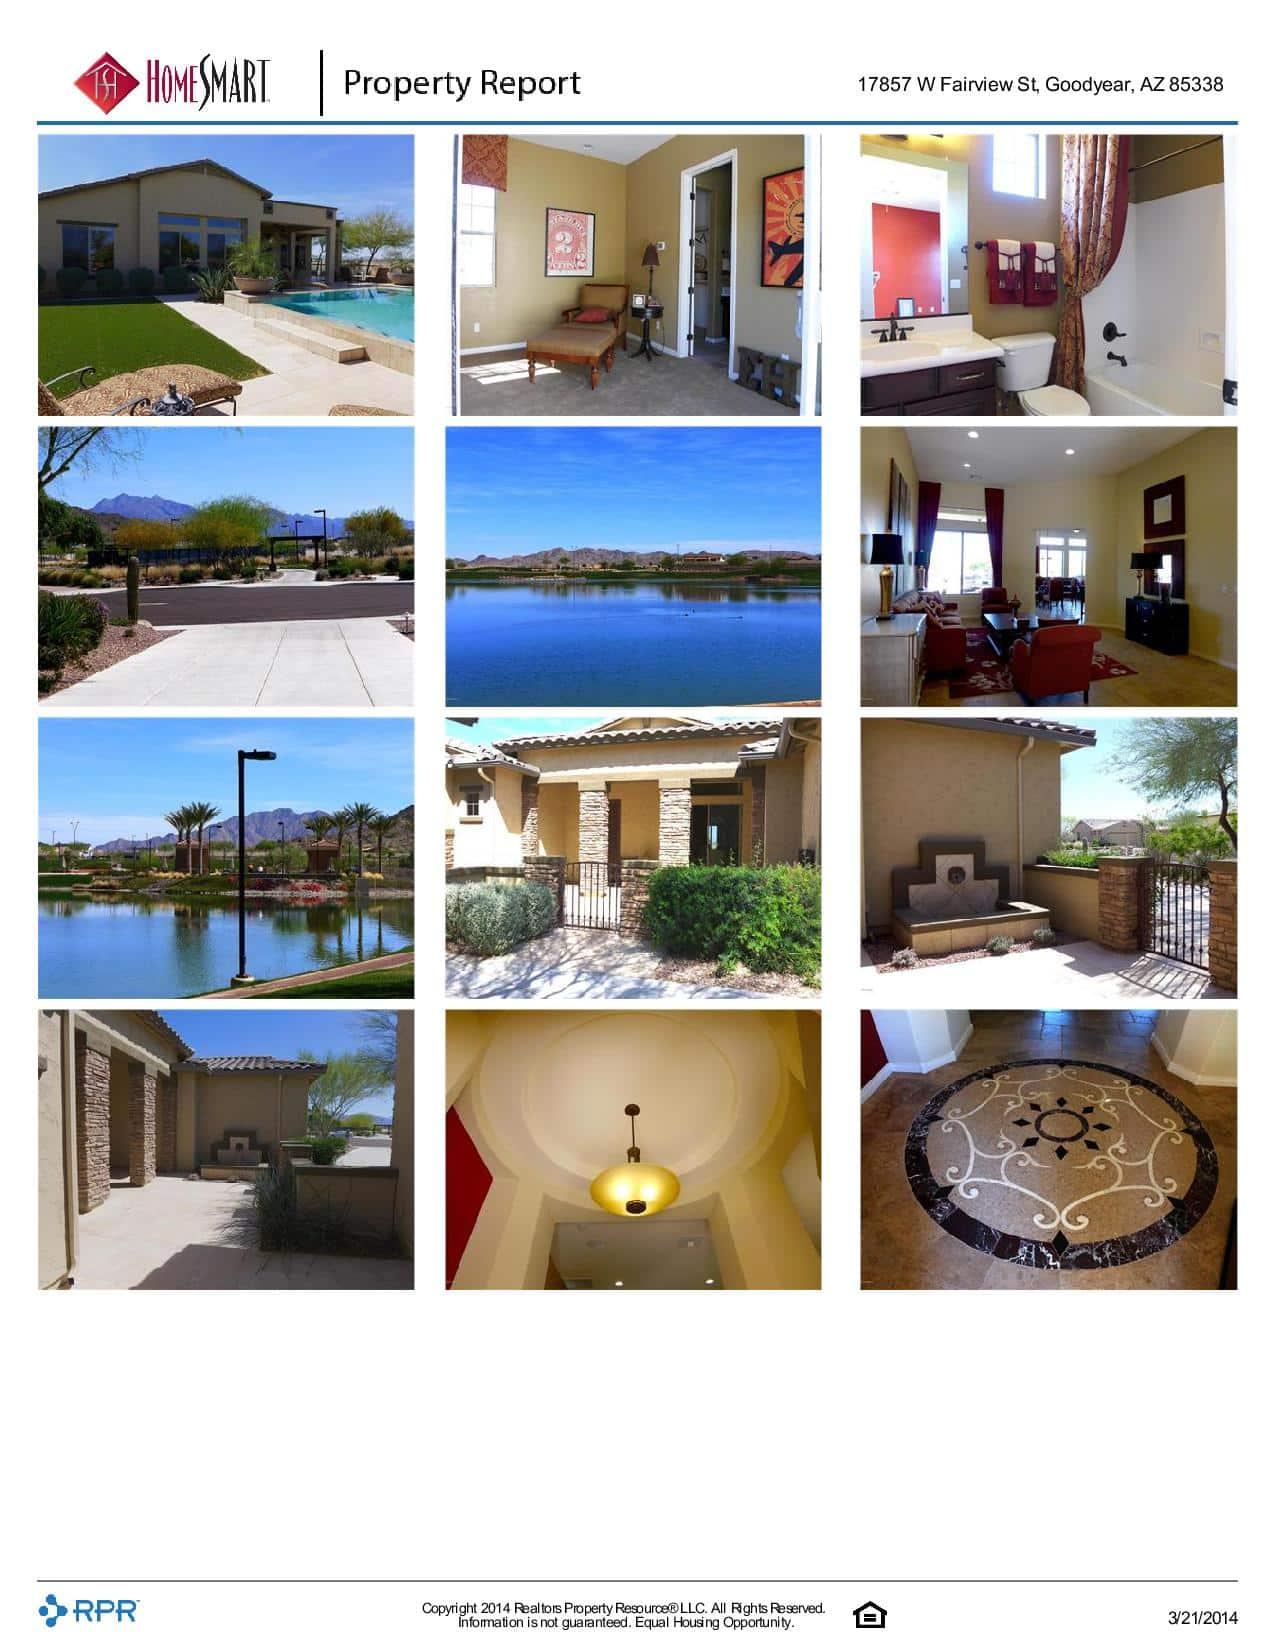 17857-W-Fairview-St-Goodyear-AZ-85338-page-006